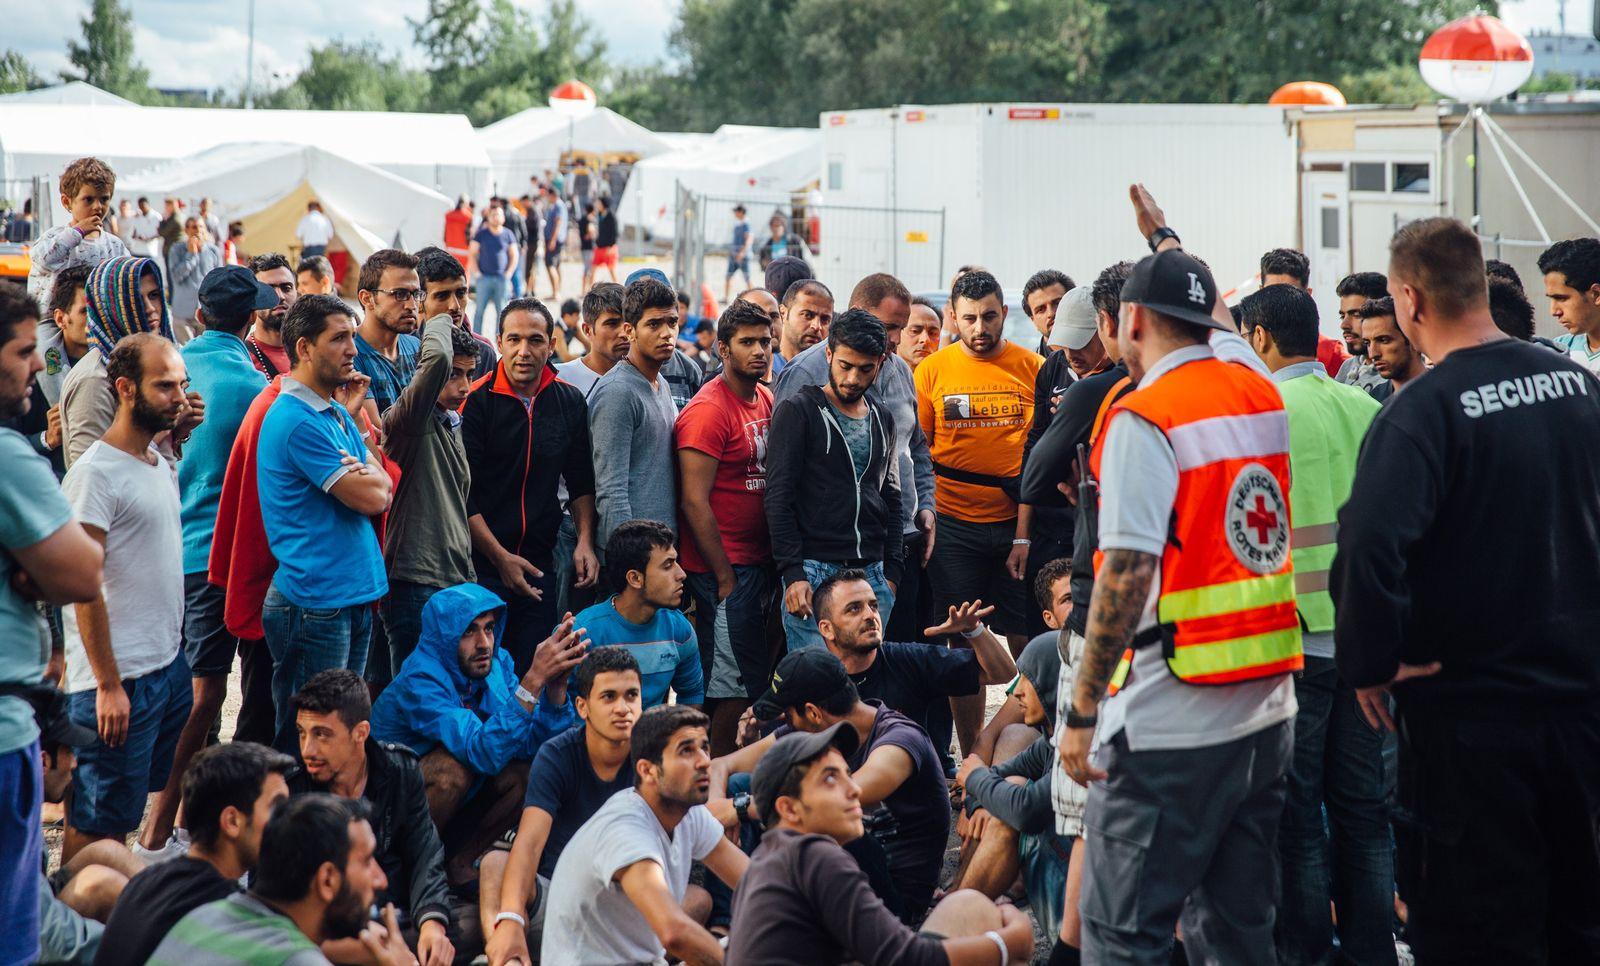 Flüchtlingsprotest in Dresden